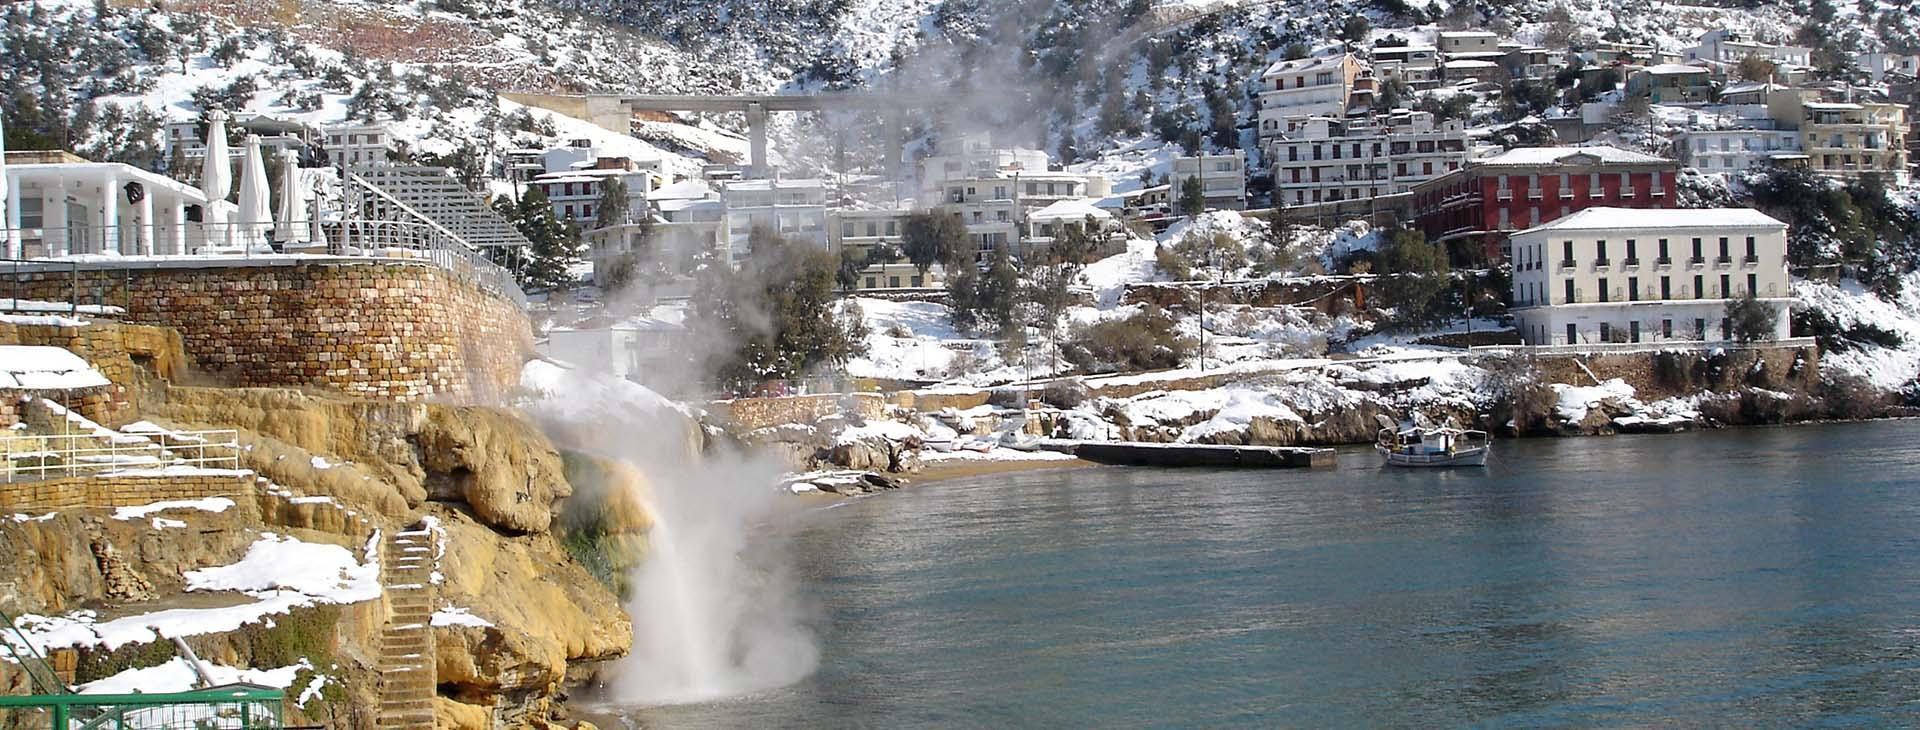 Hot spring at Loutrá Edipssoú, Evia